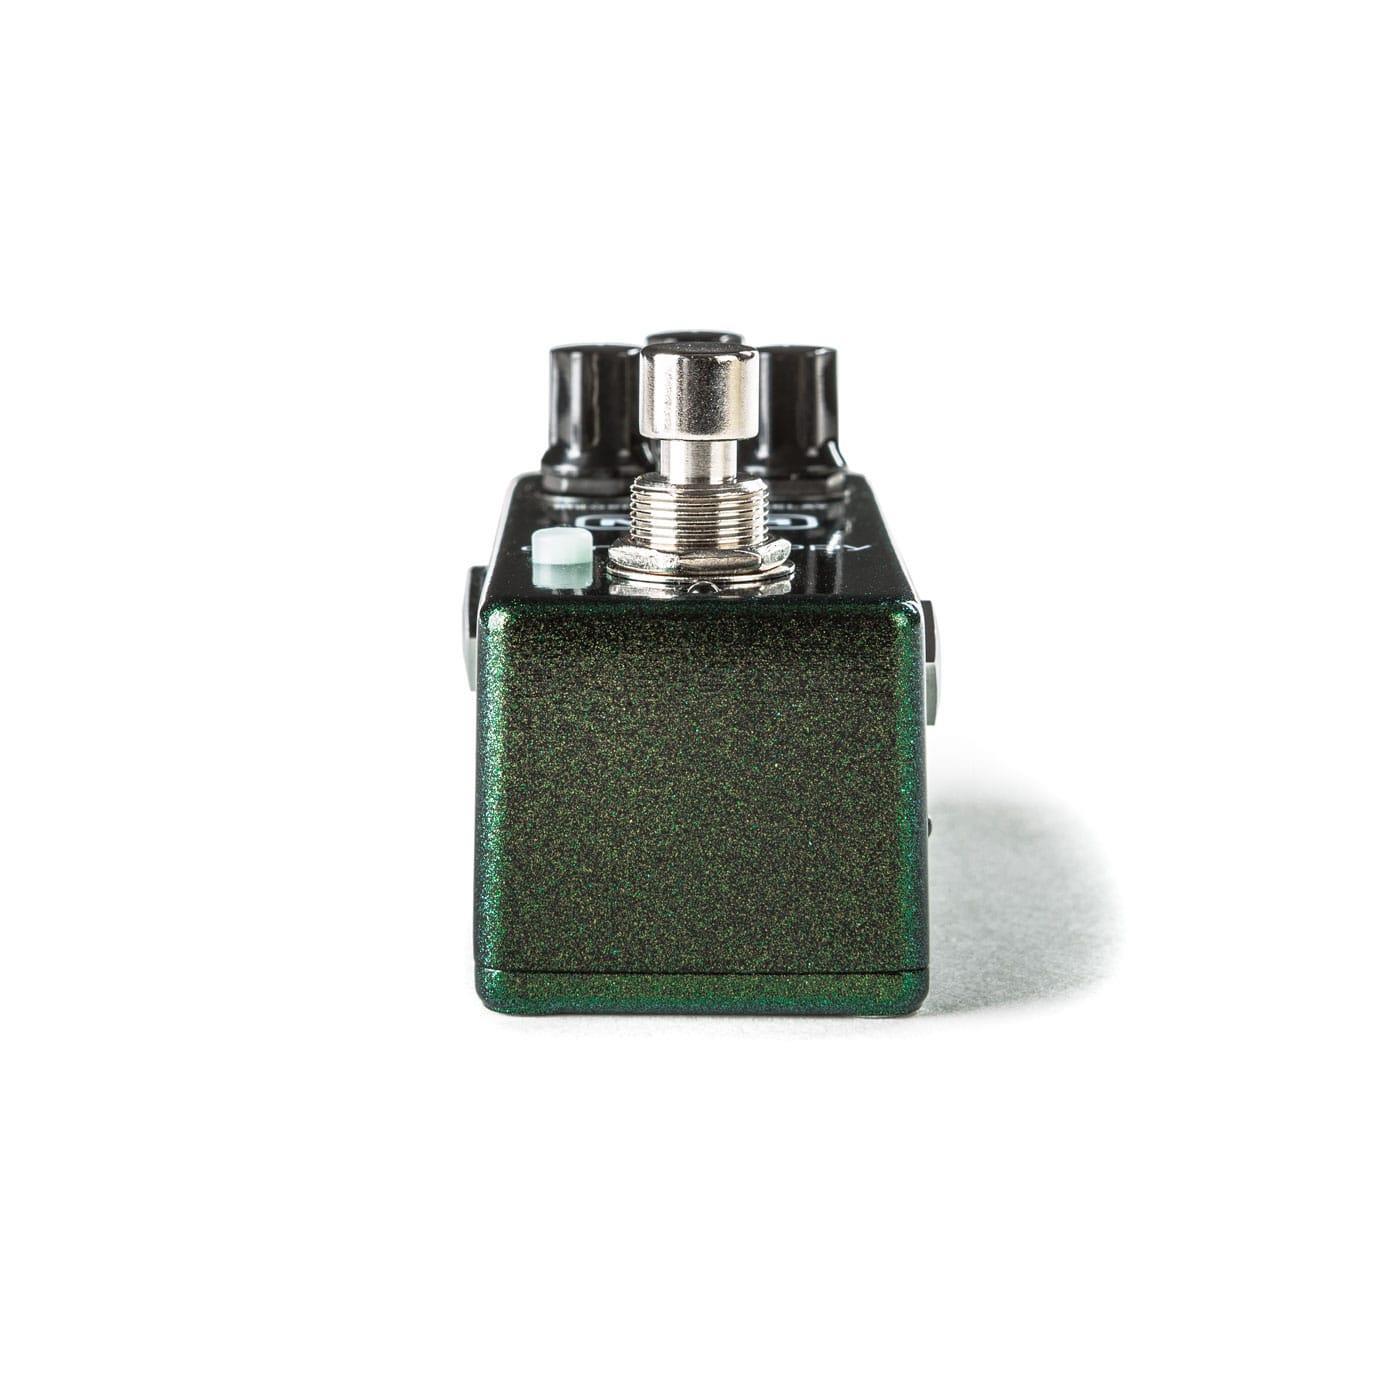 MXR M299 Carbon Copy Mini Delay pedal w/ 9v power supply